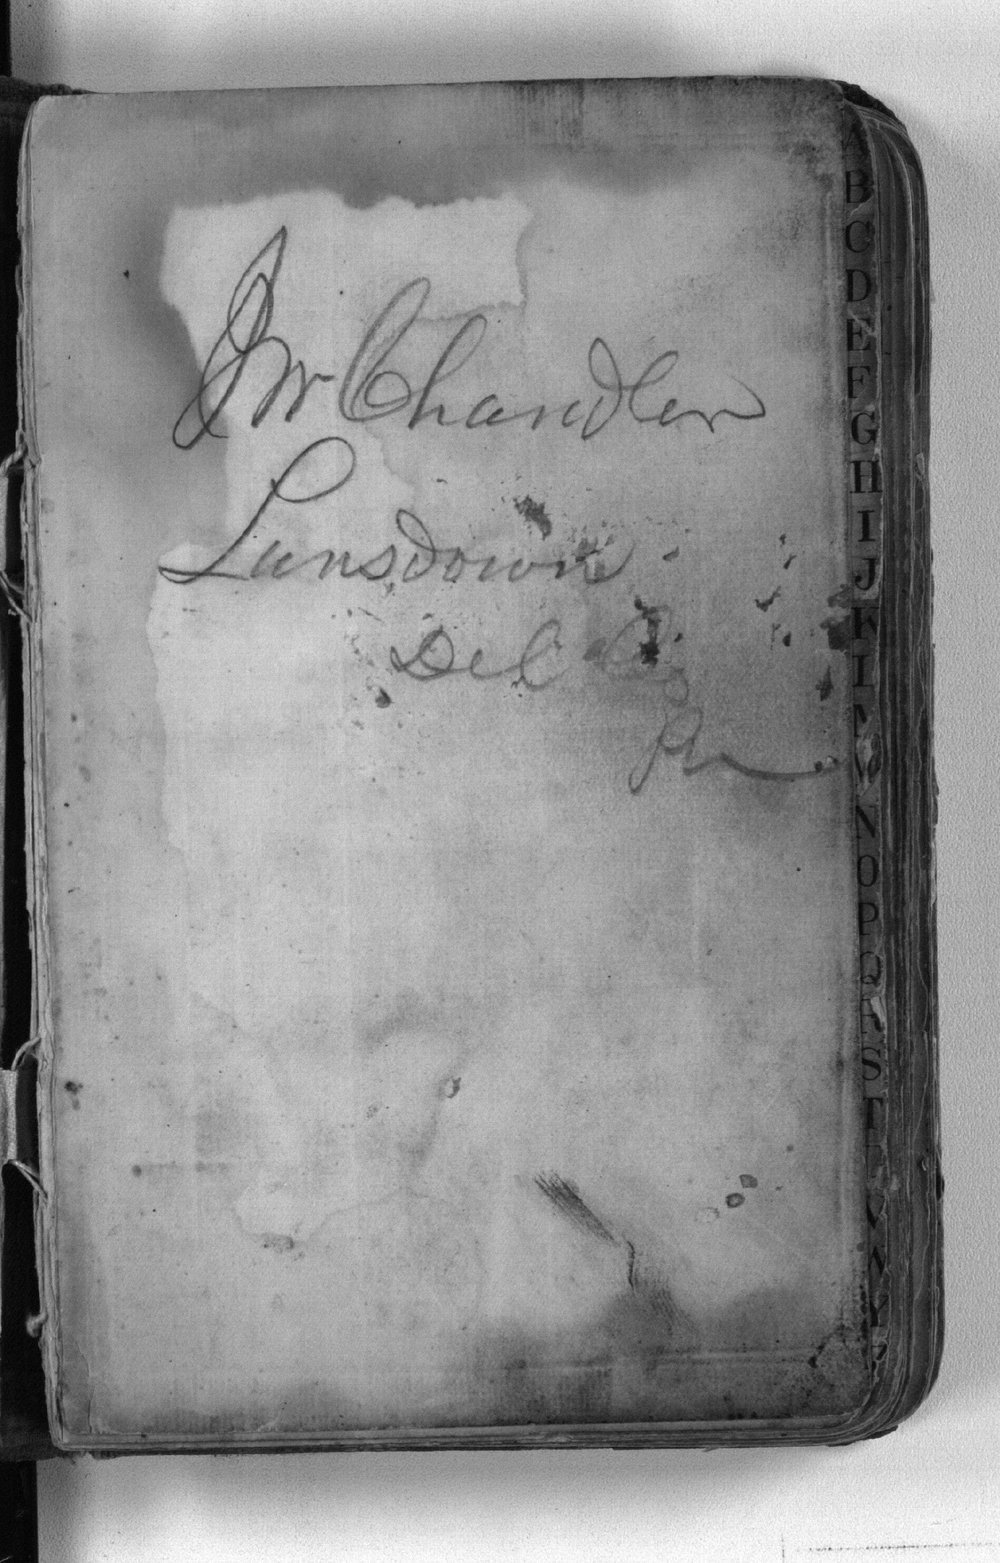 F. W. Yanner cookbook - name